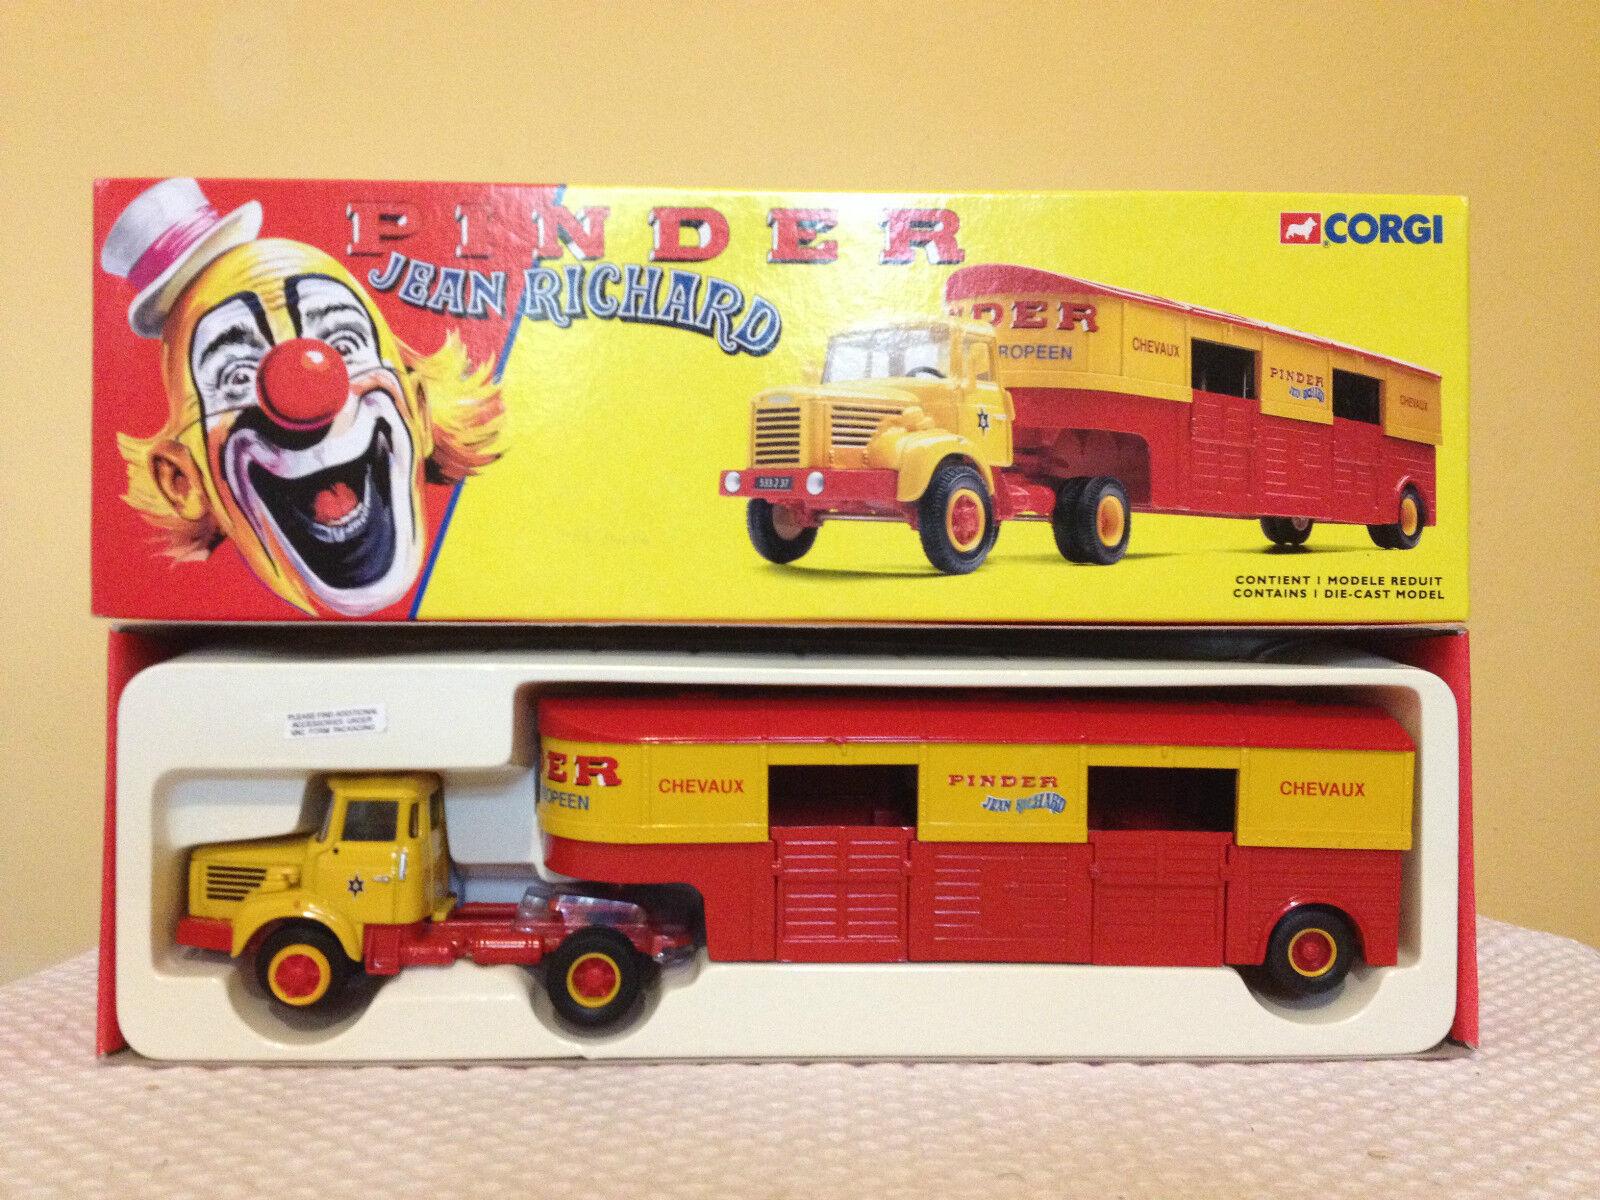 Corgi 70301-Pinder Jean Richard-Berliet TLR-Semi transporte caballos-MIB